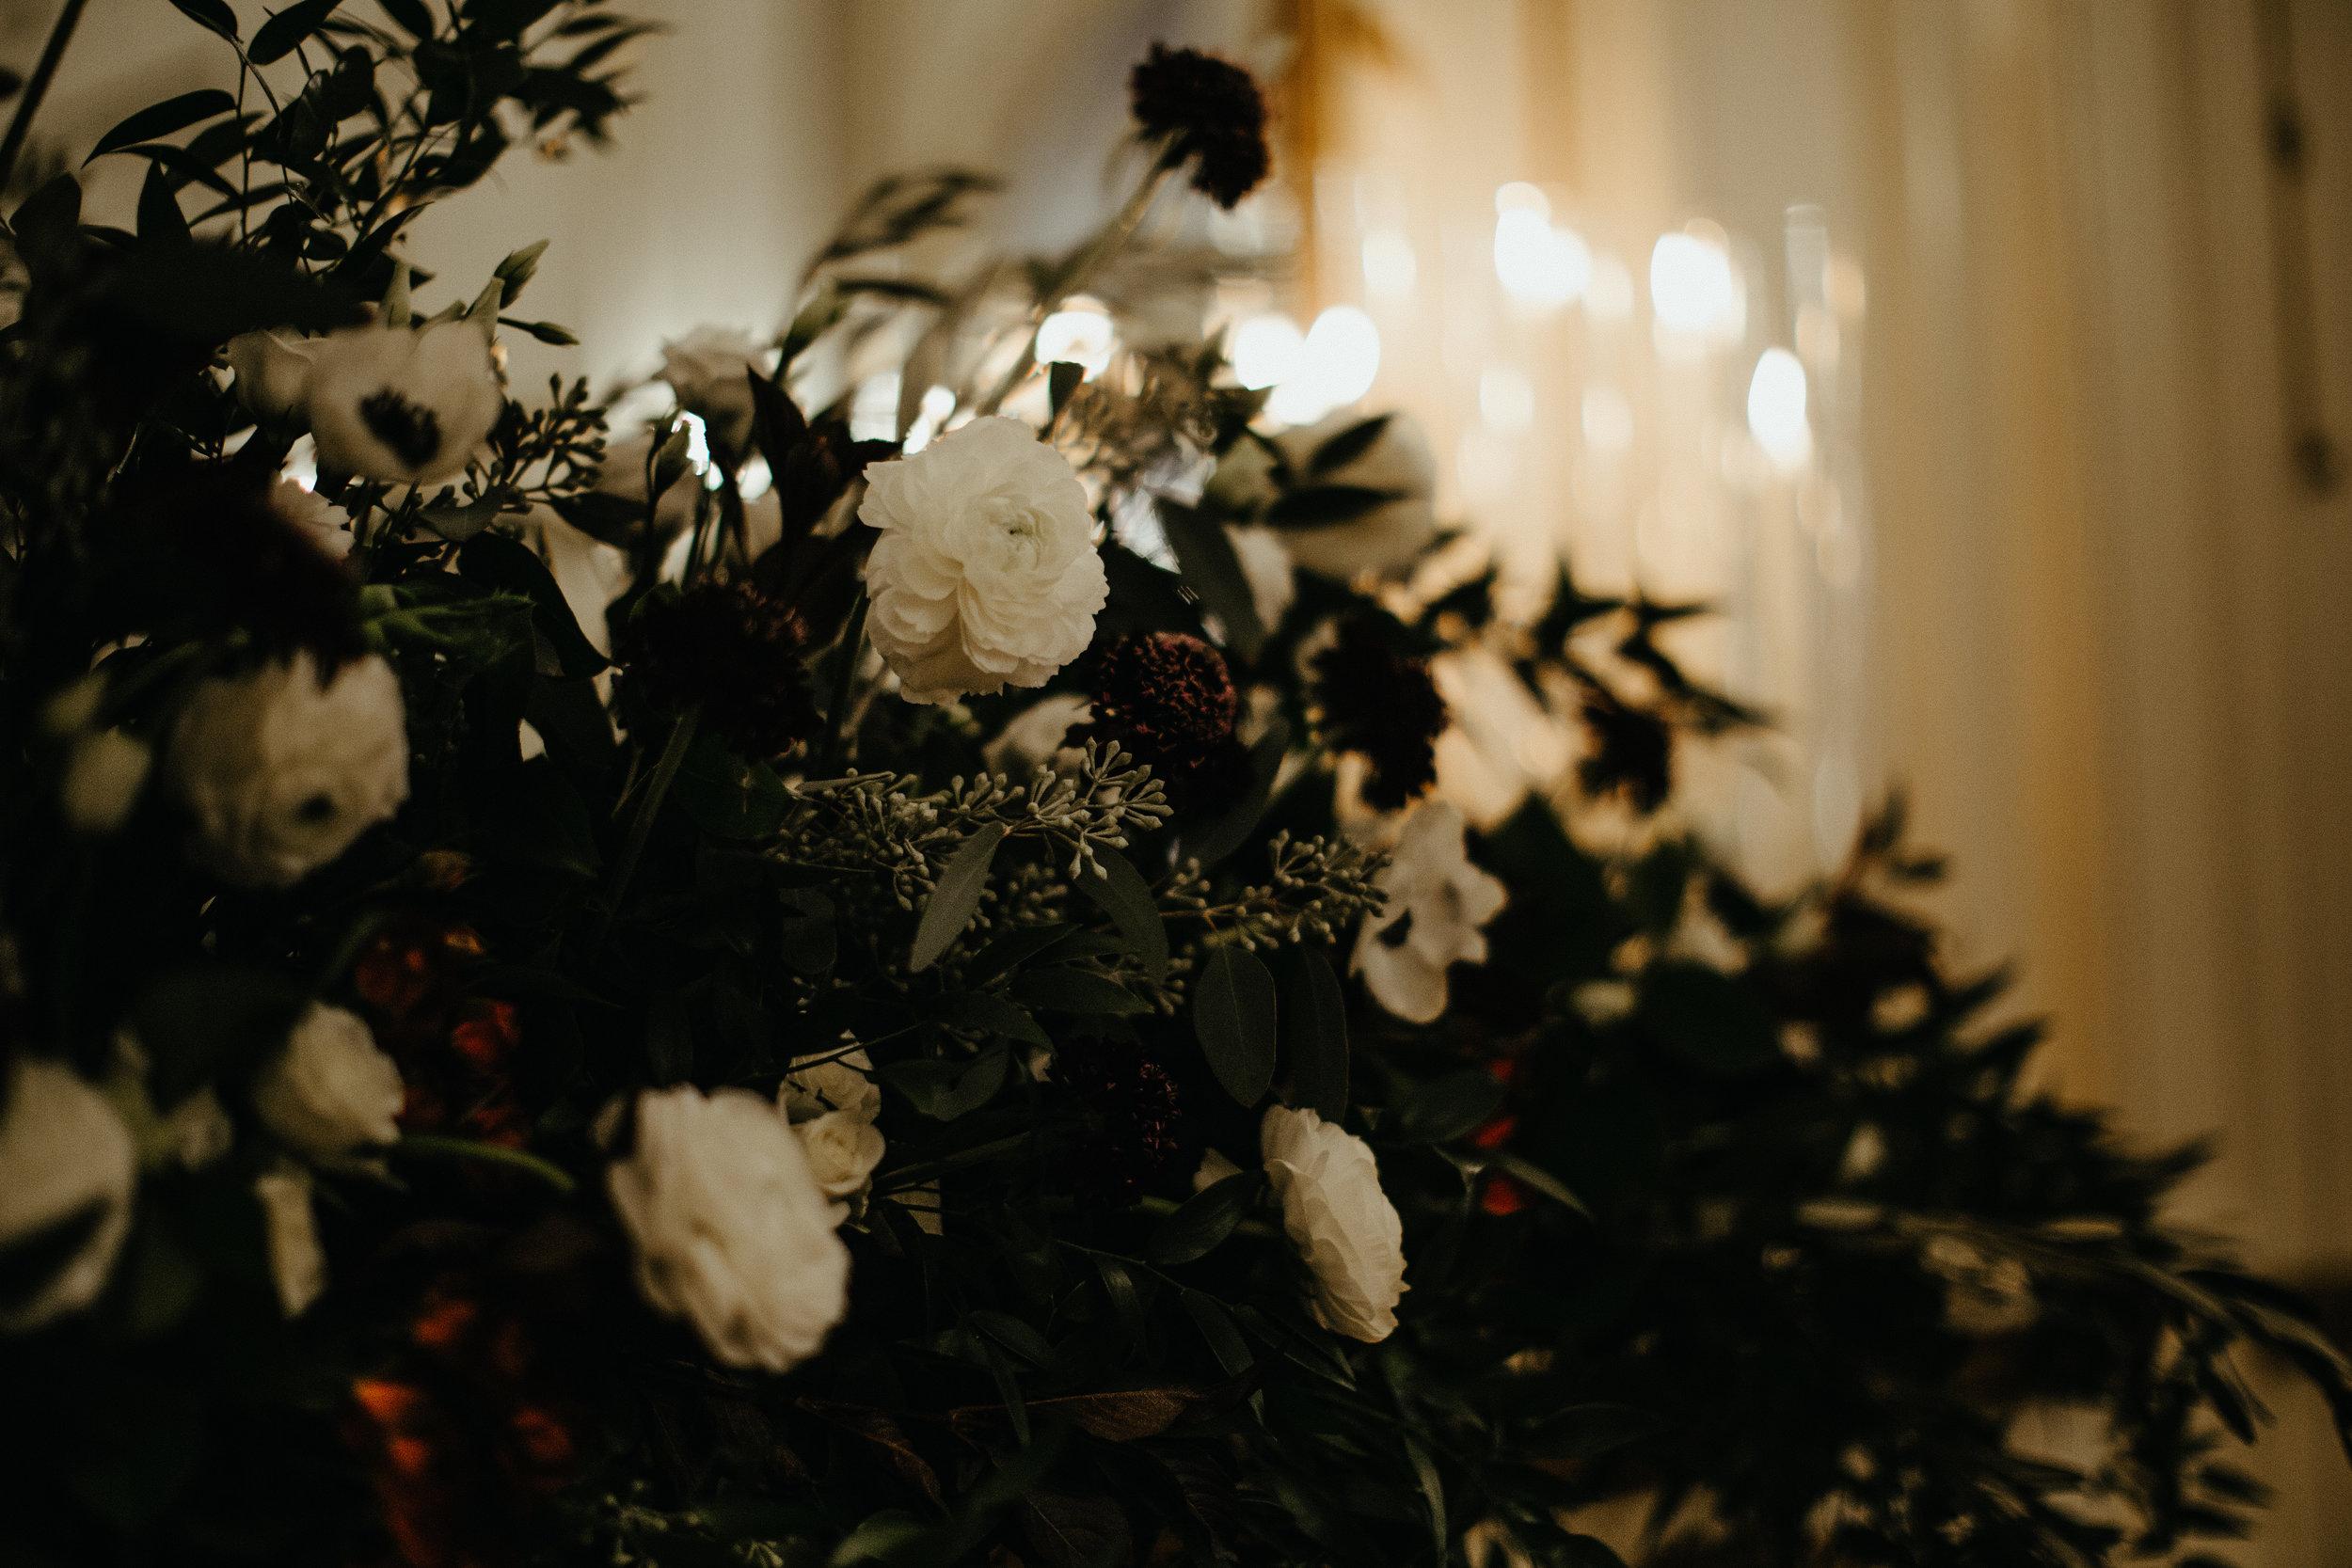 beverly_ma_wedding-56.jpg